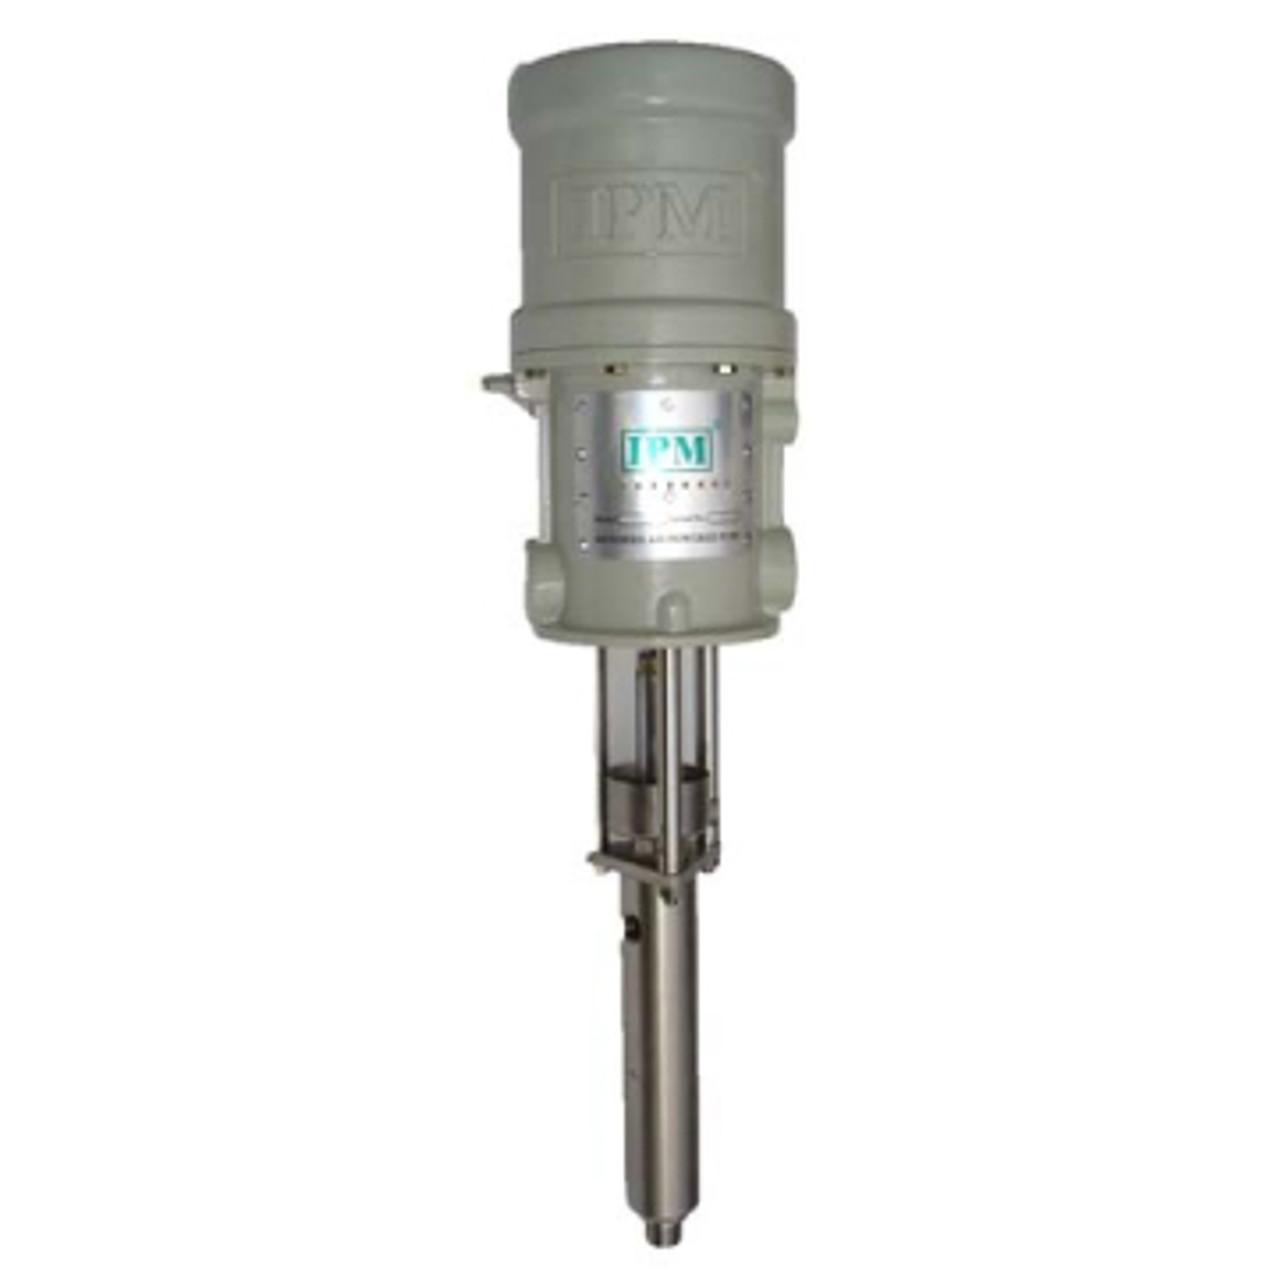 IPM IP-05S Transfer Pump (5:1 Ratio)